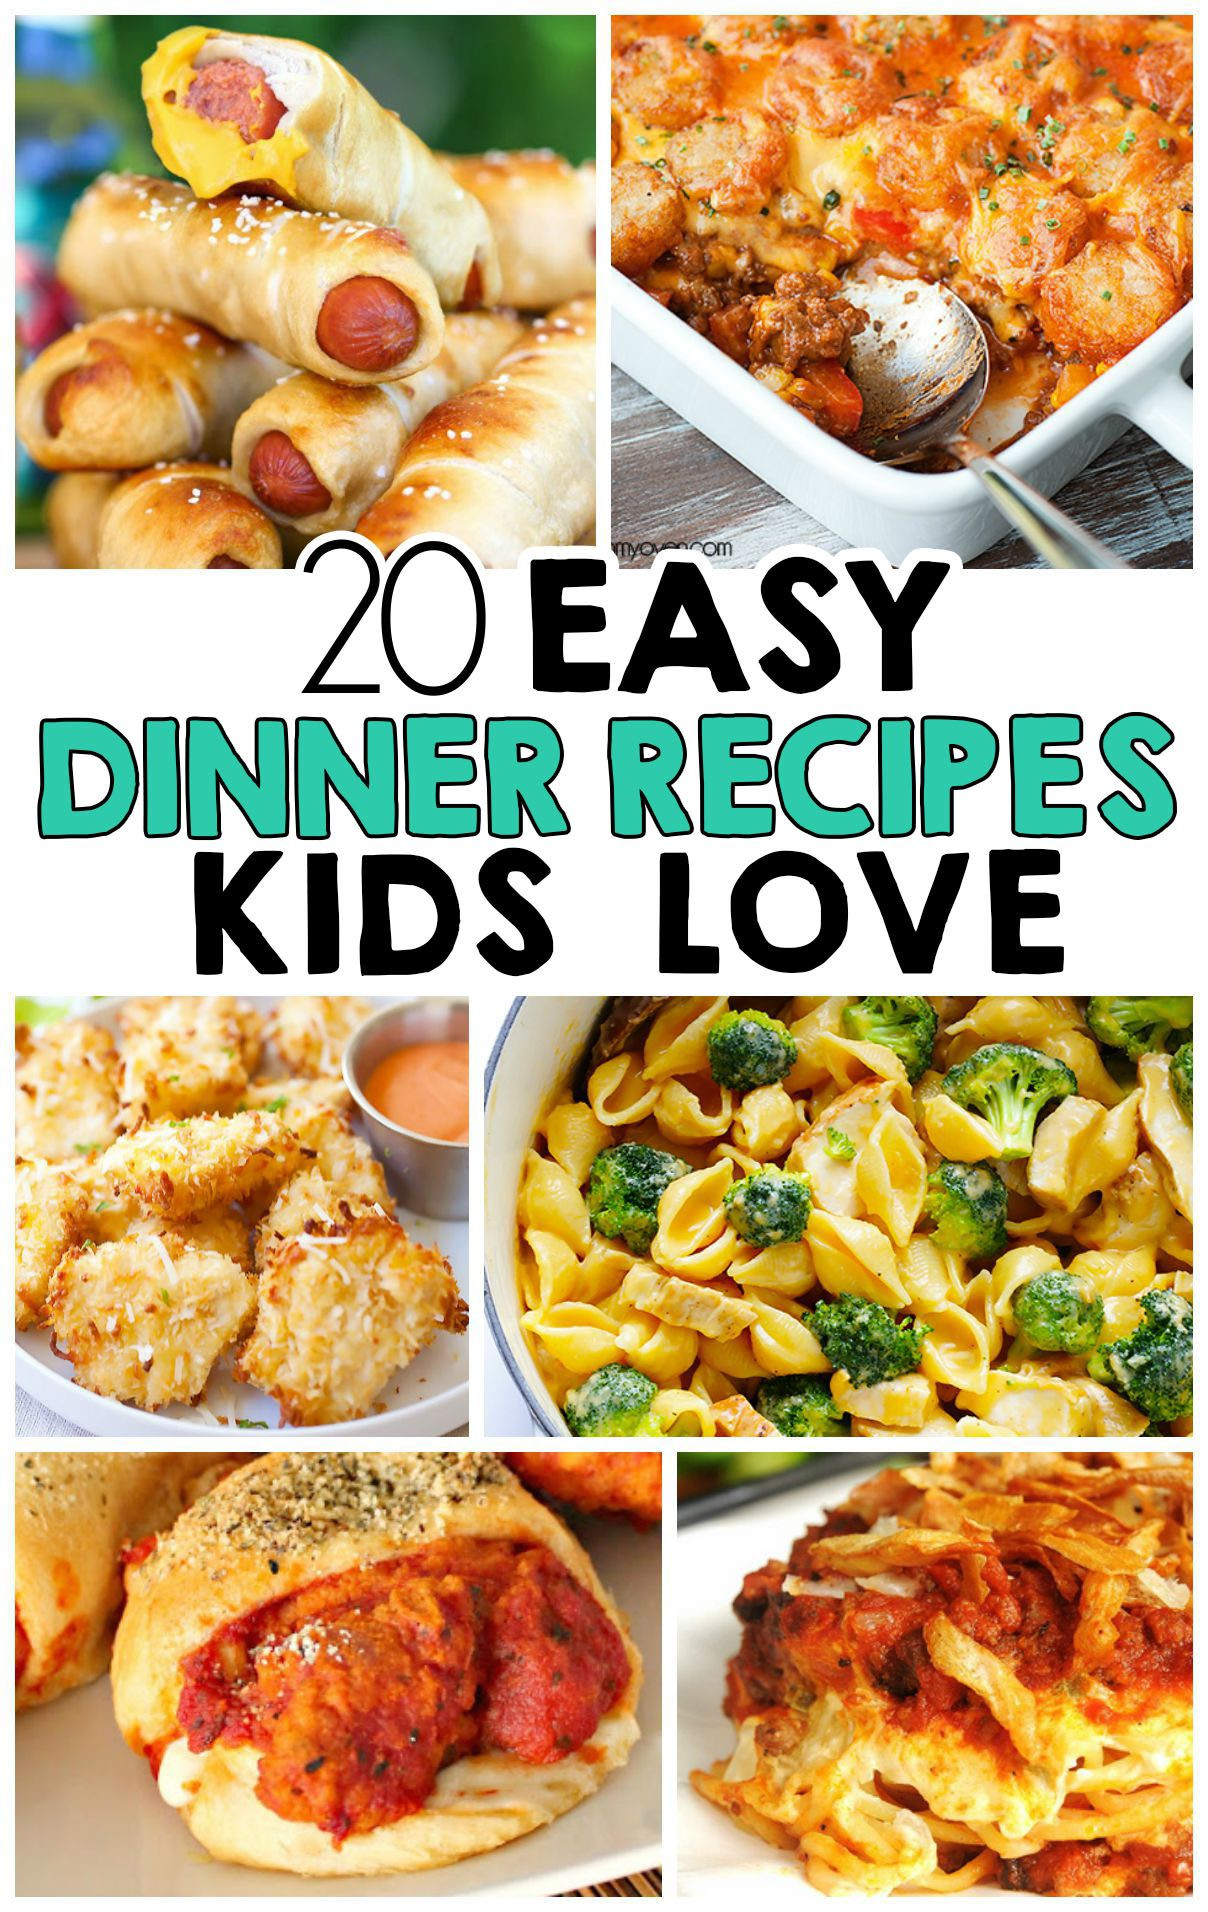 Healthy Dinners Kids Love  20 Easy Dinner Recipes That Kids Love